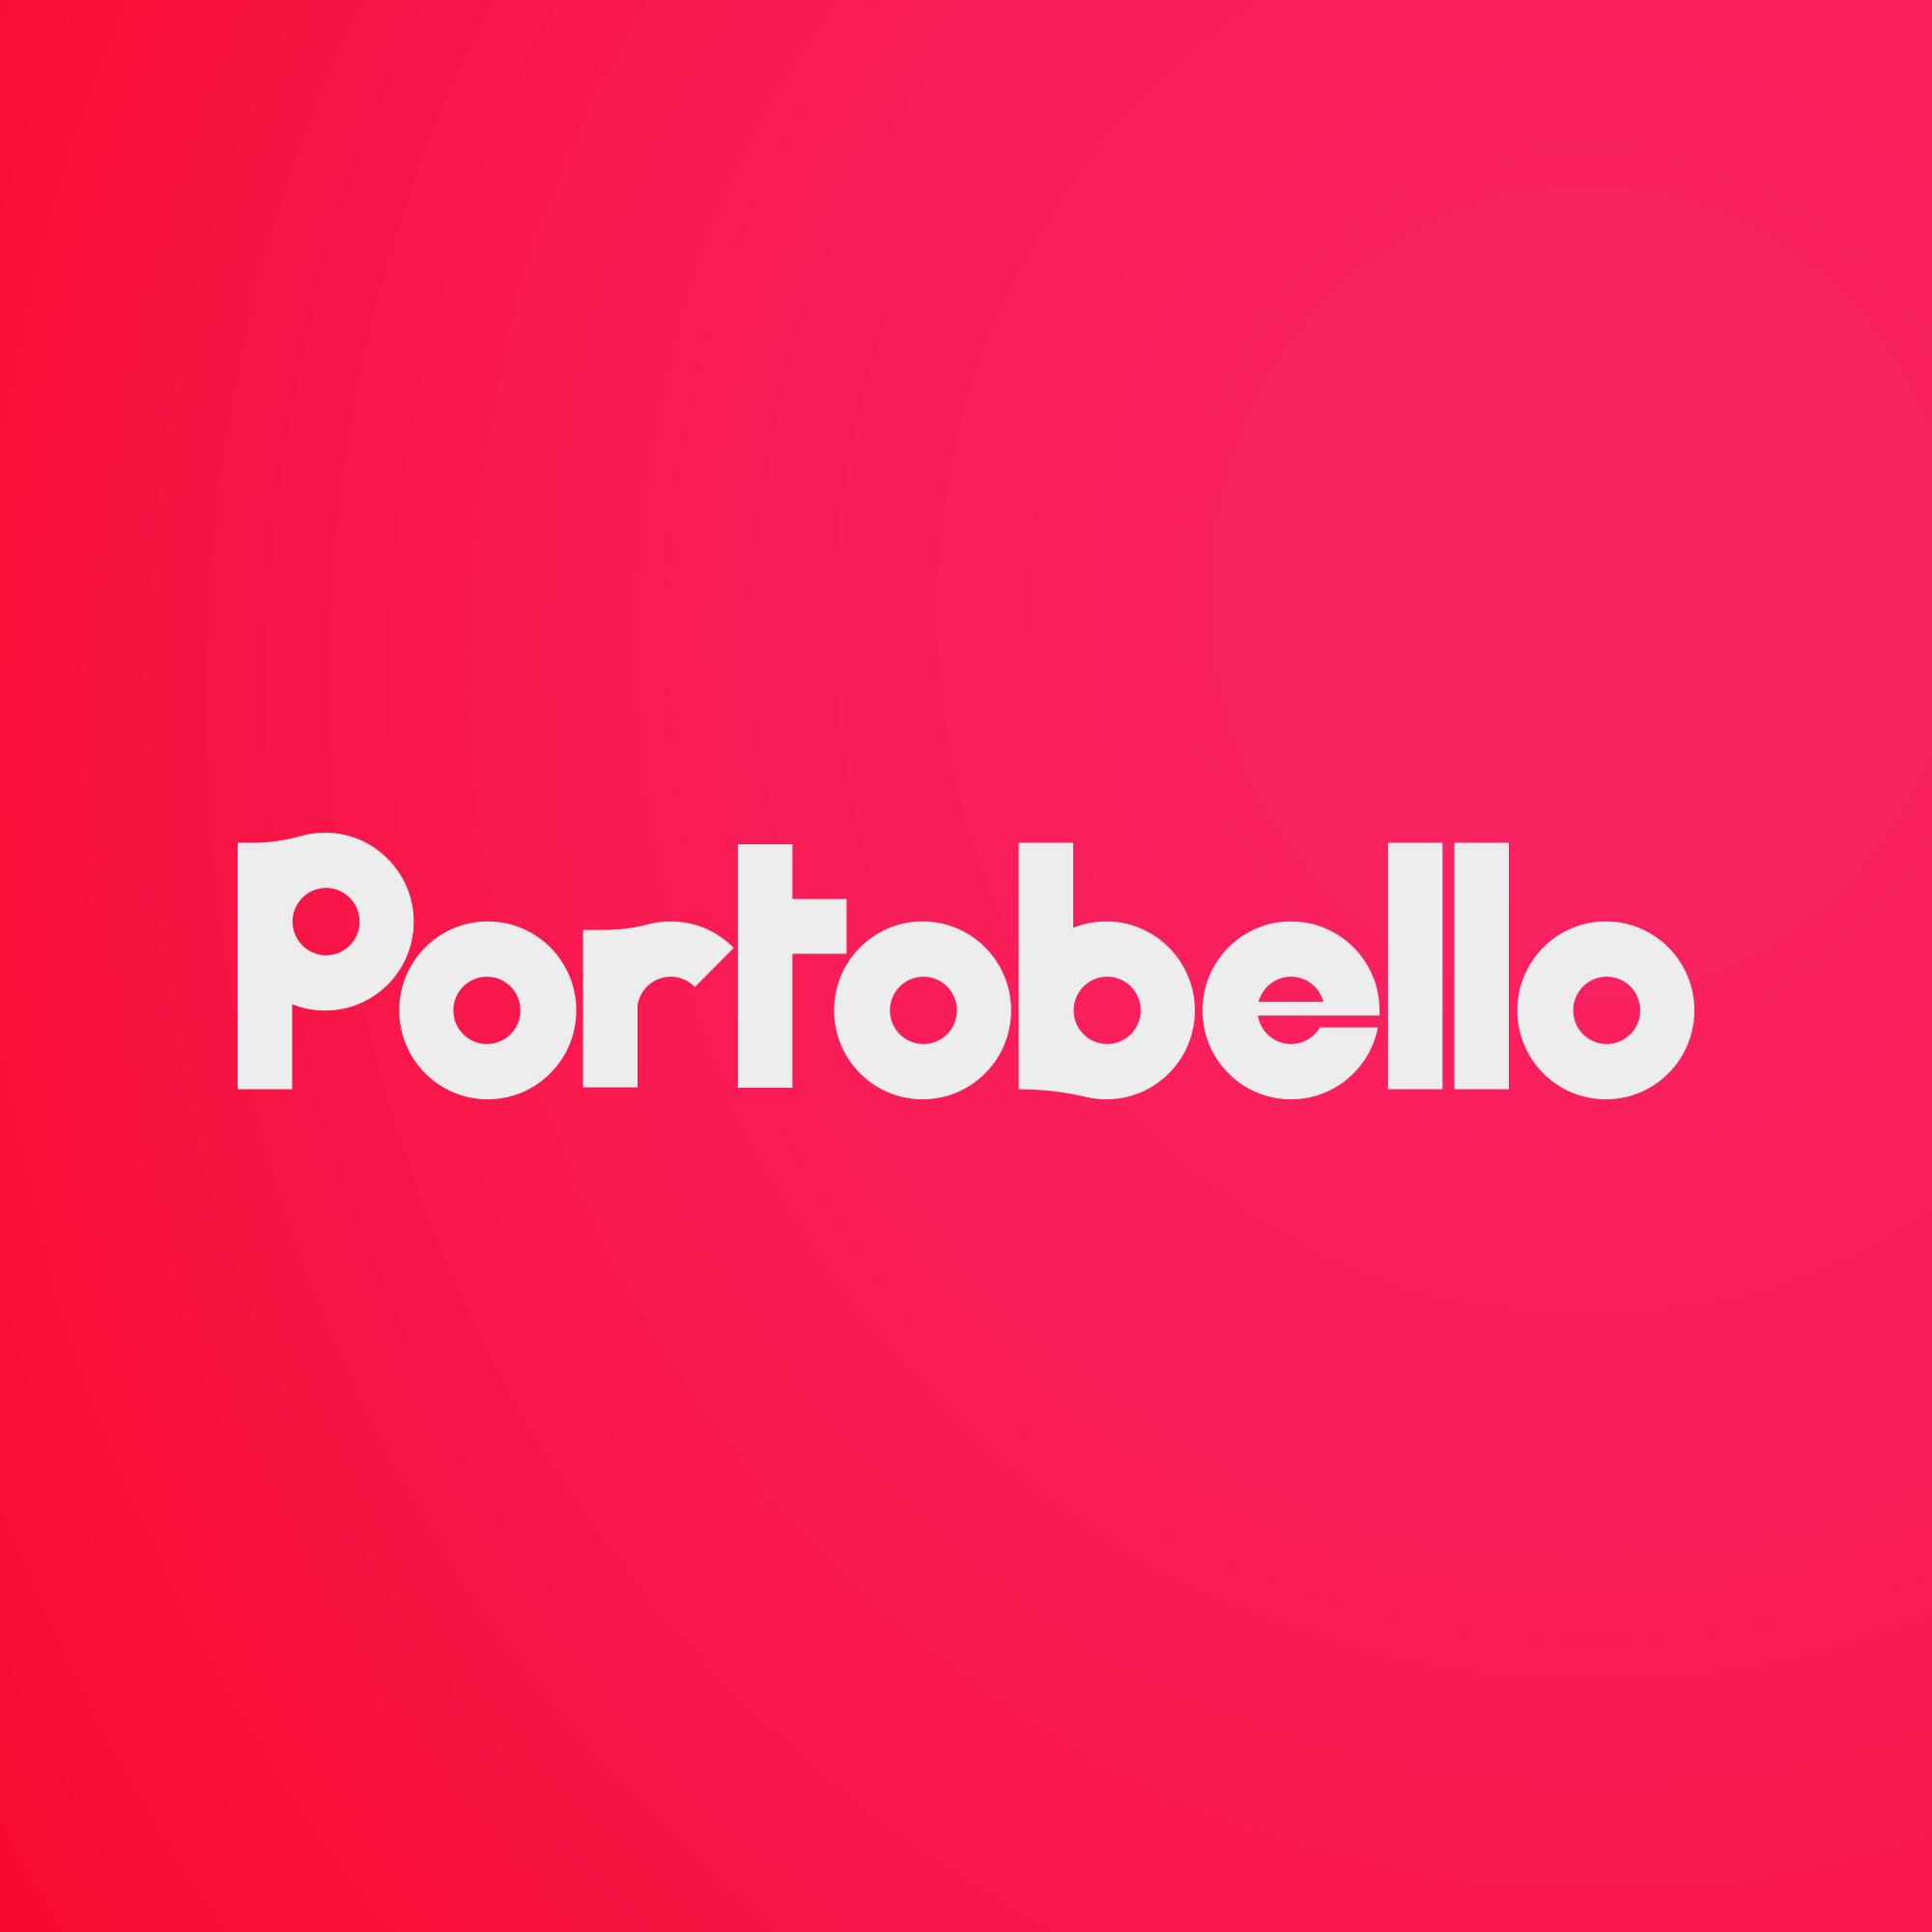 portobello-A4-by-ALSO-Agency-00.jpg